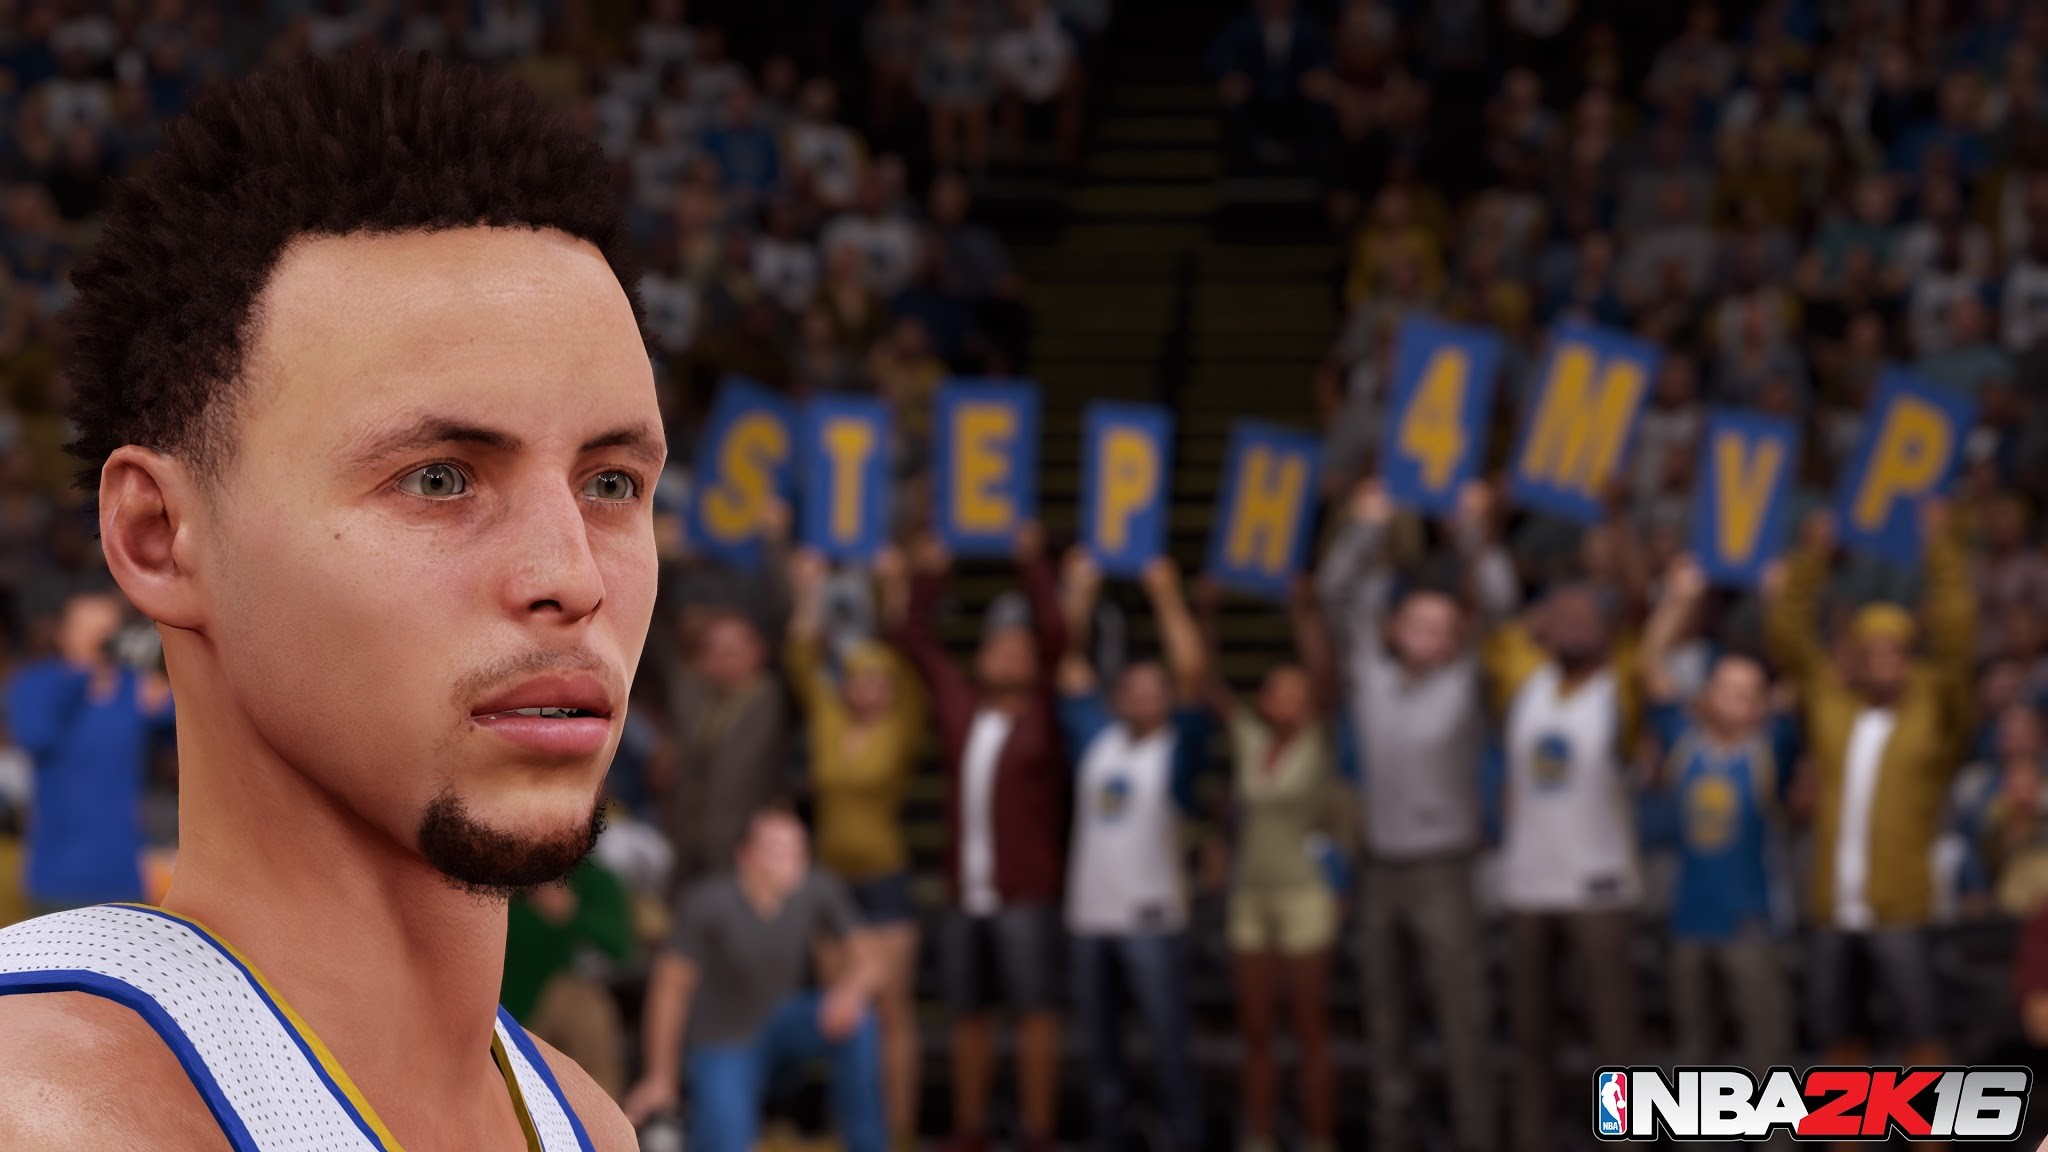 NBA 2K16 Steph Curry Screenshot